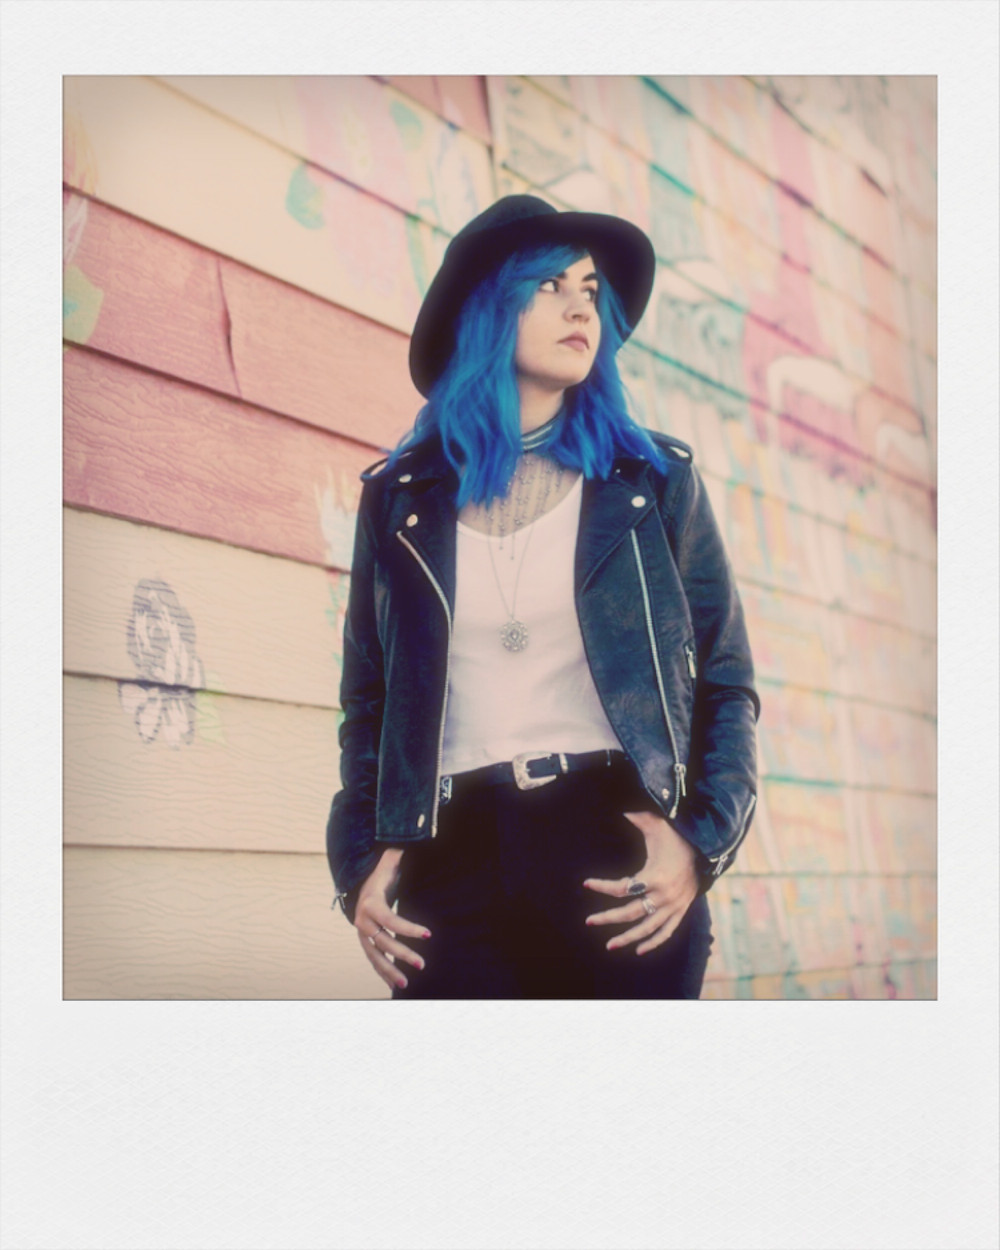 Melanie @melanierenmusic